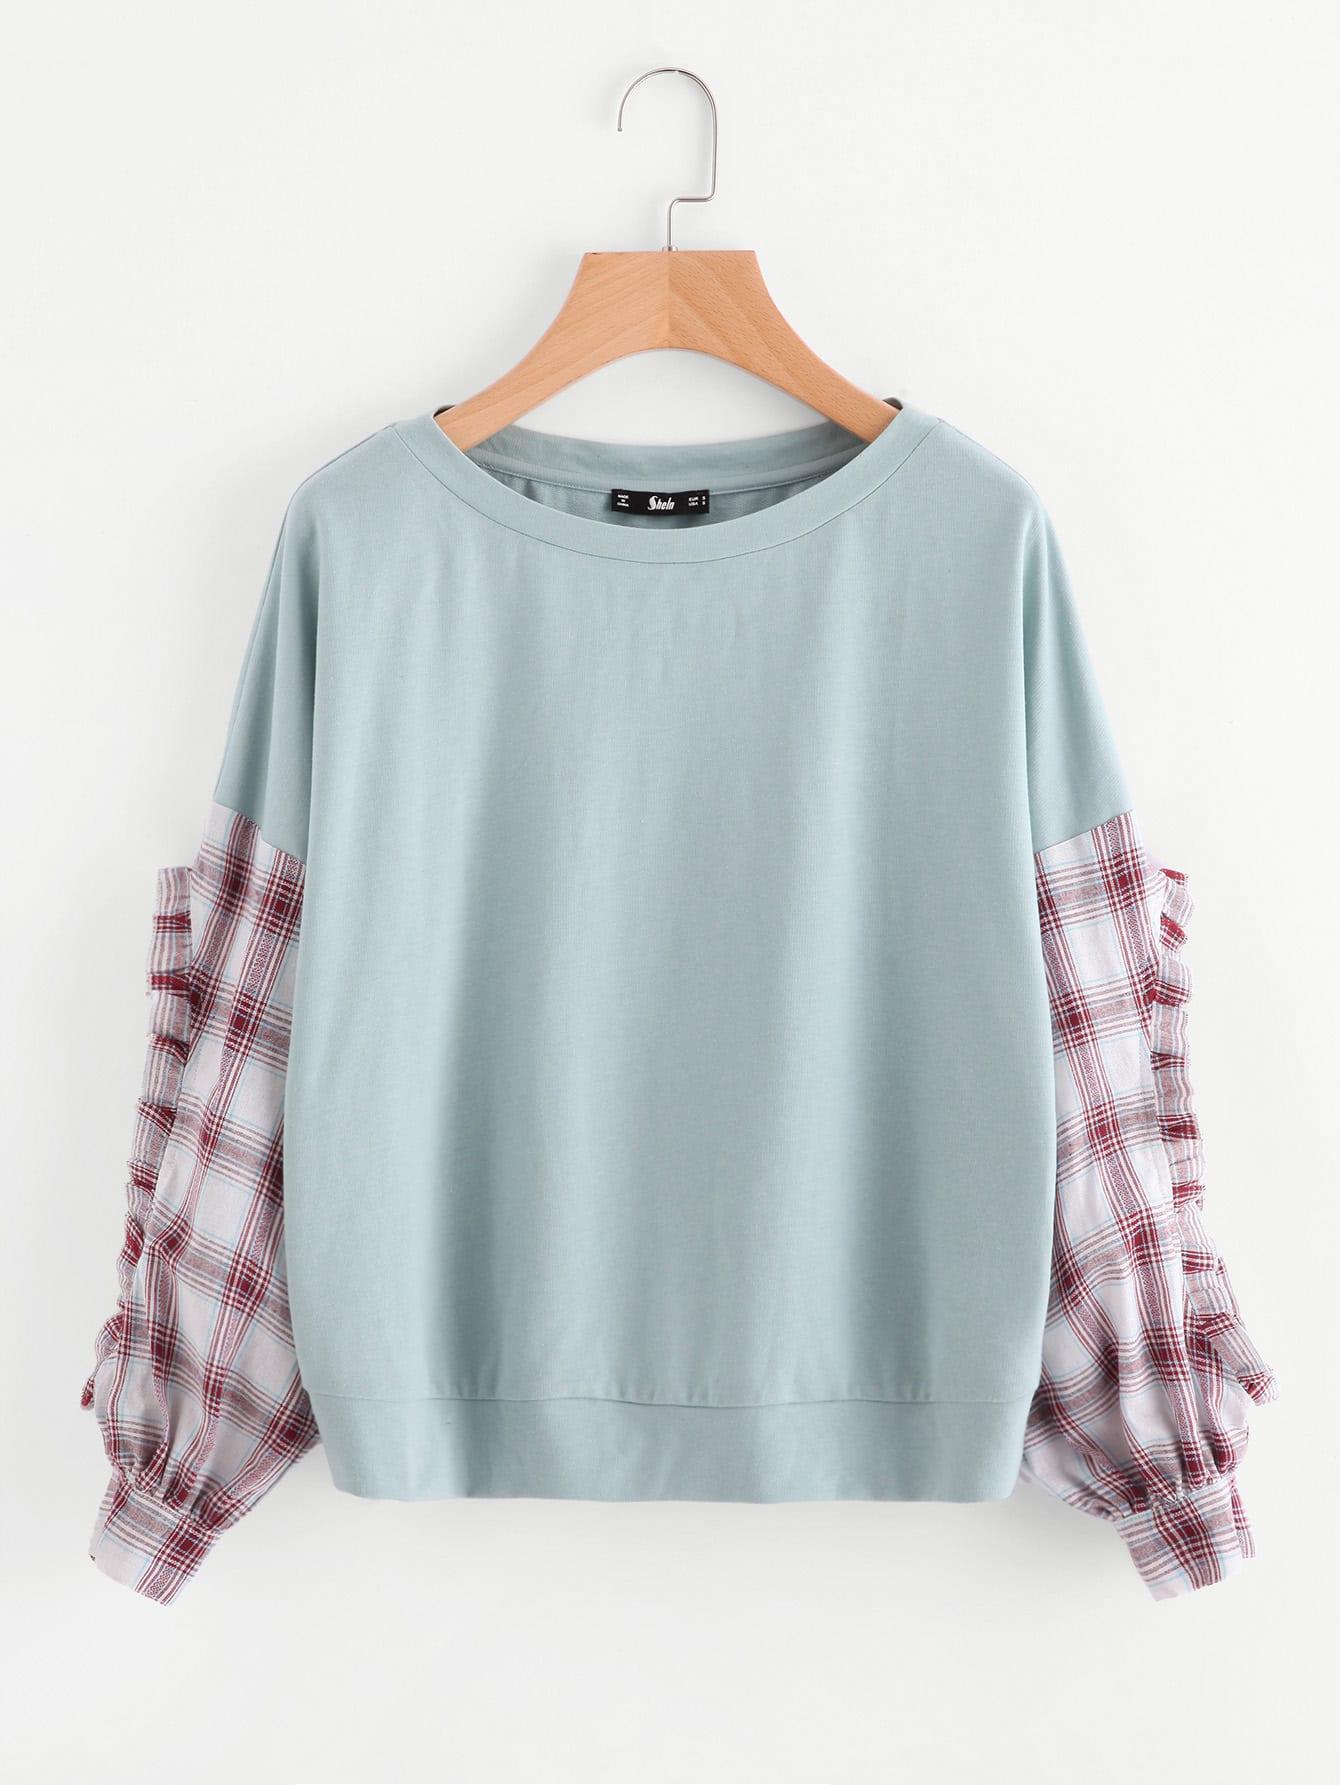 Frilled Checkered Sleeve Mixed Media Sweatshirt drop shoulder frilled sleeve sweatshirt